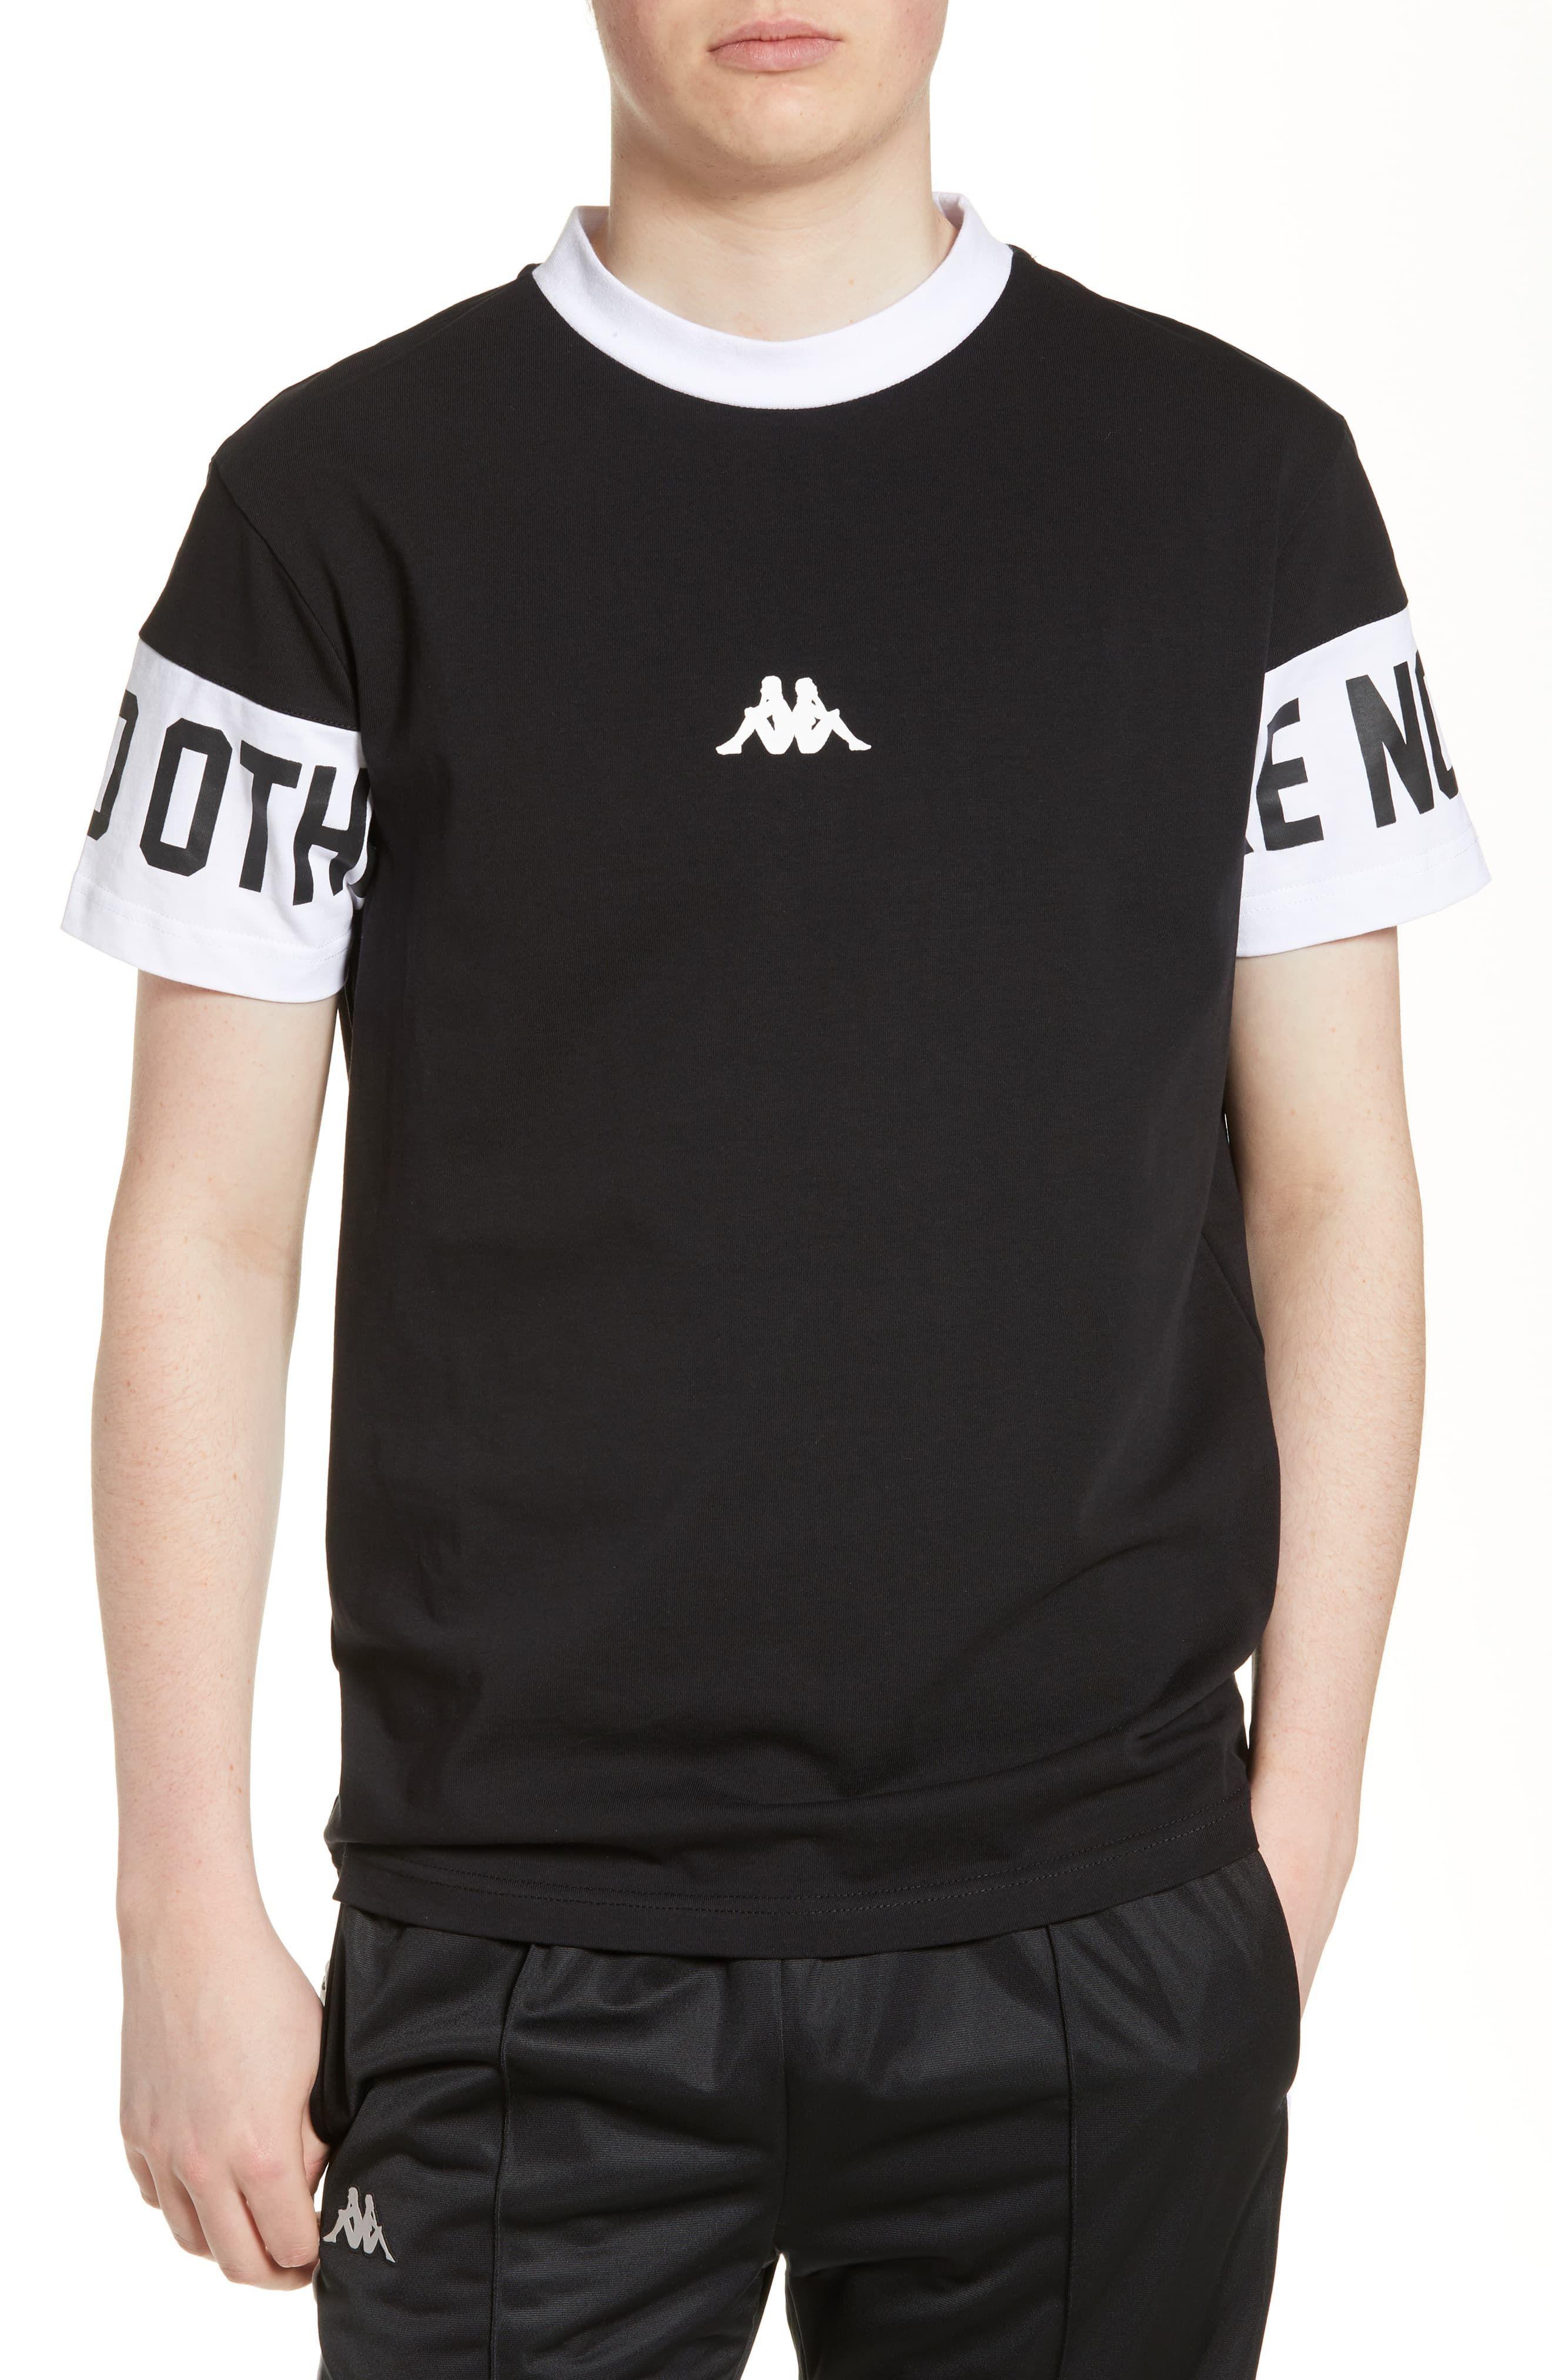 21042293a5 Men's Kappa Authentic Baltos T-Shirt, Size Large - Black | Products ...